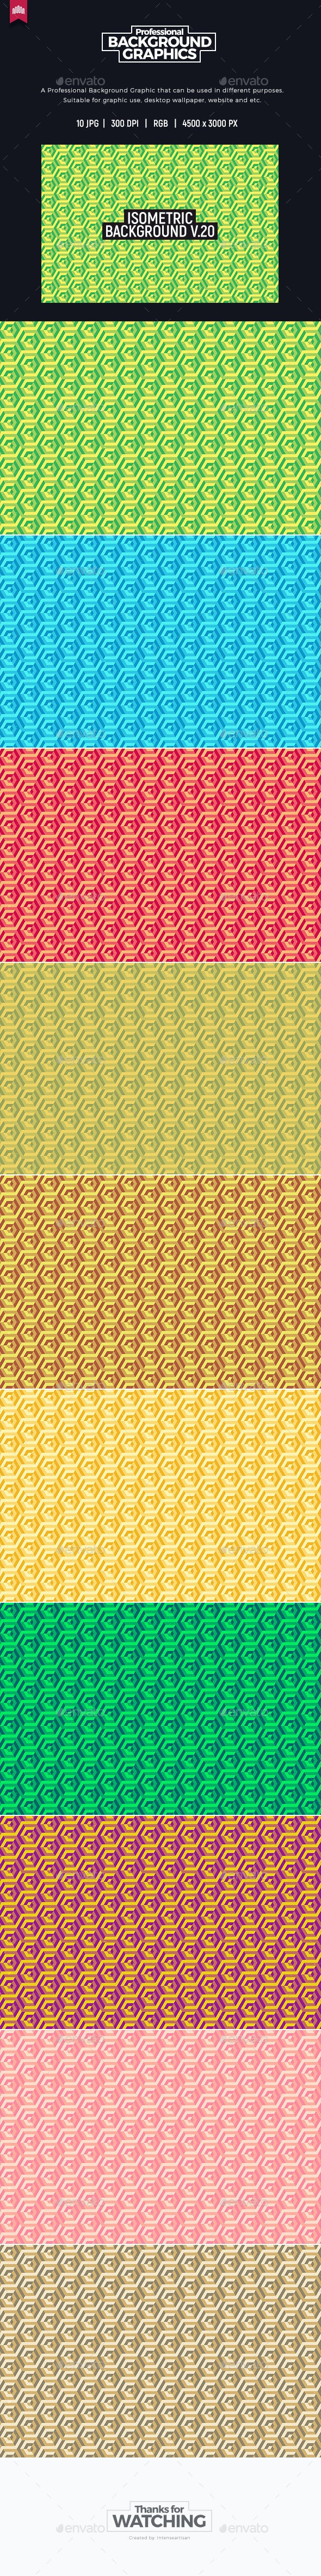 Isometric Background V.20 - Patterns Backgrounds